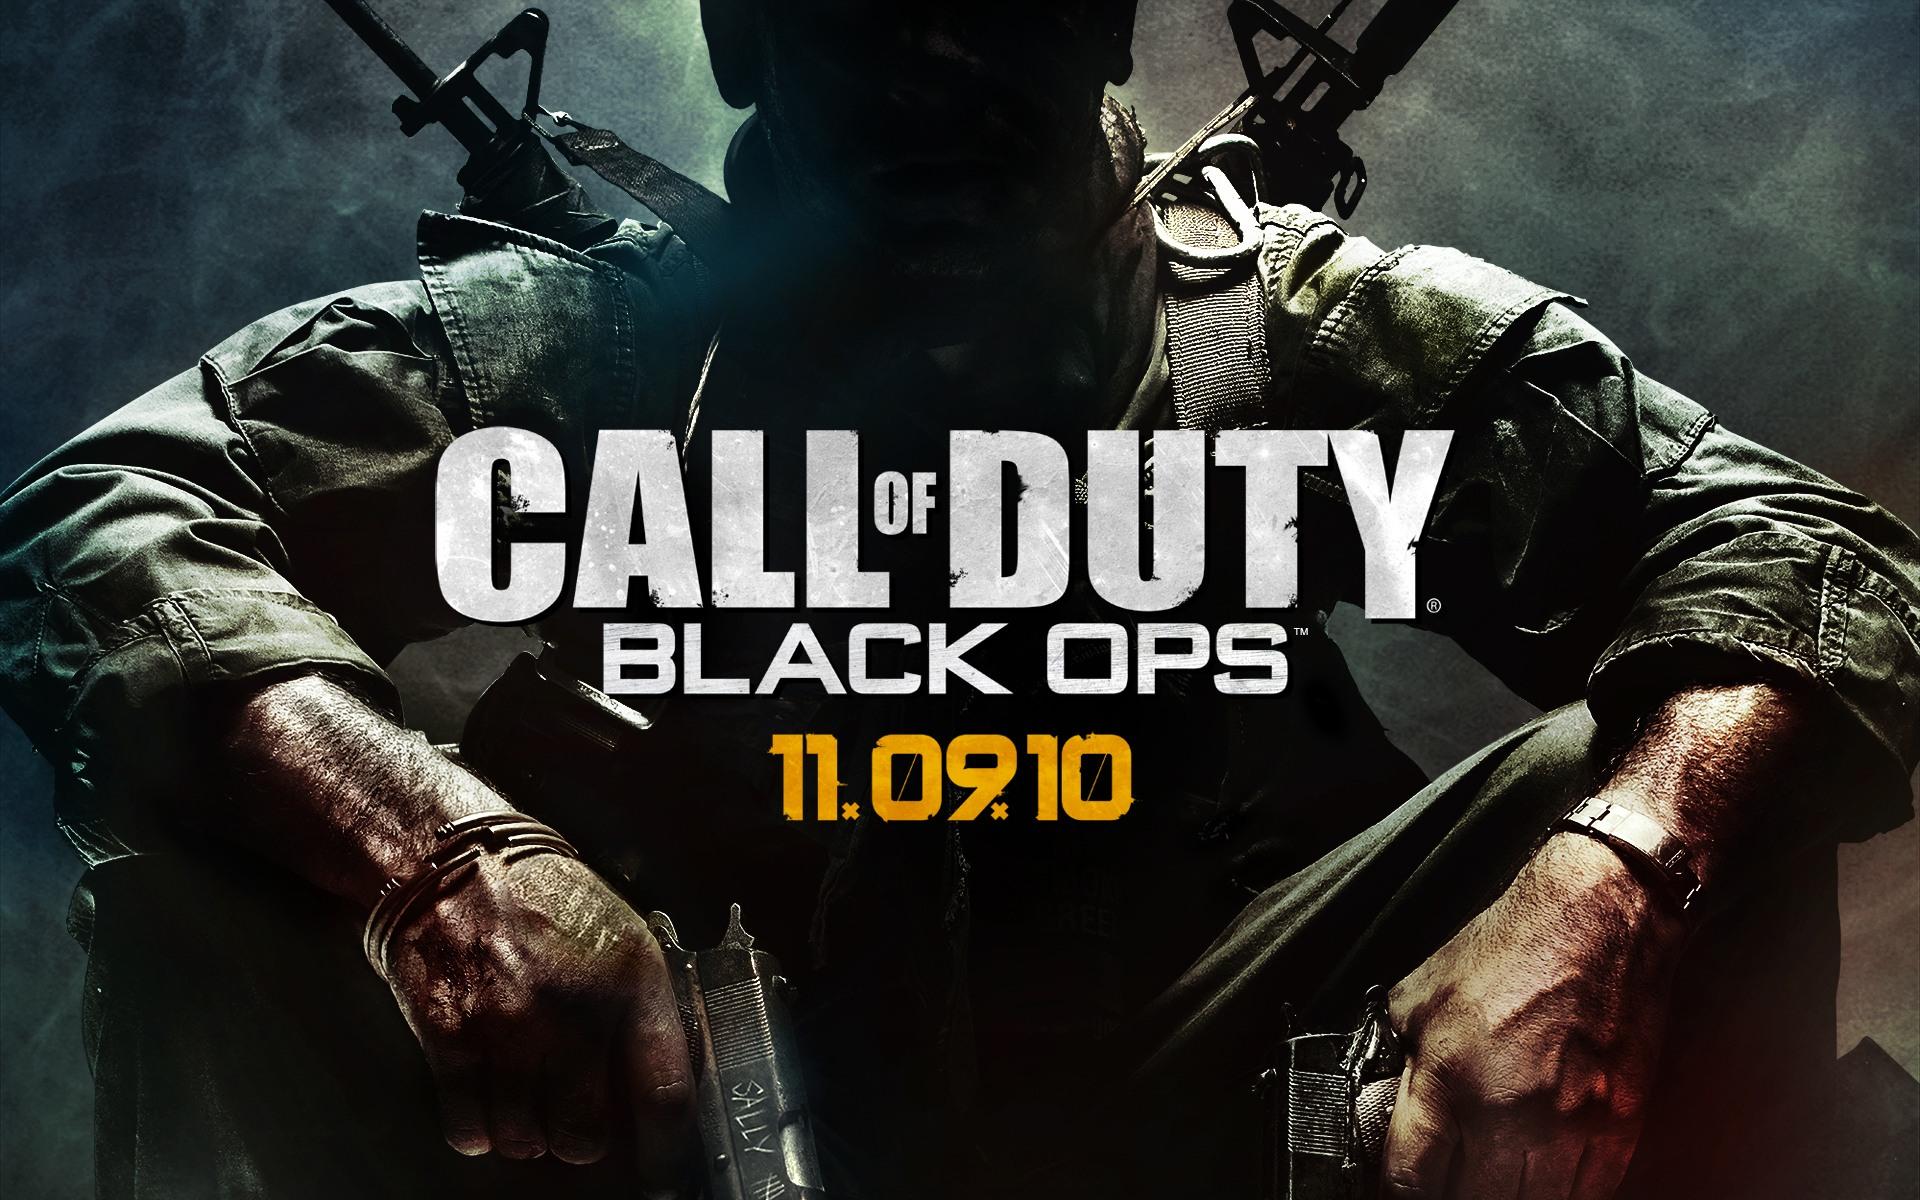 Call of Duty Black Ops desktop wallpaper 1920x1200